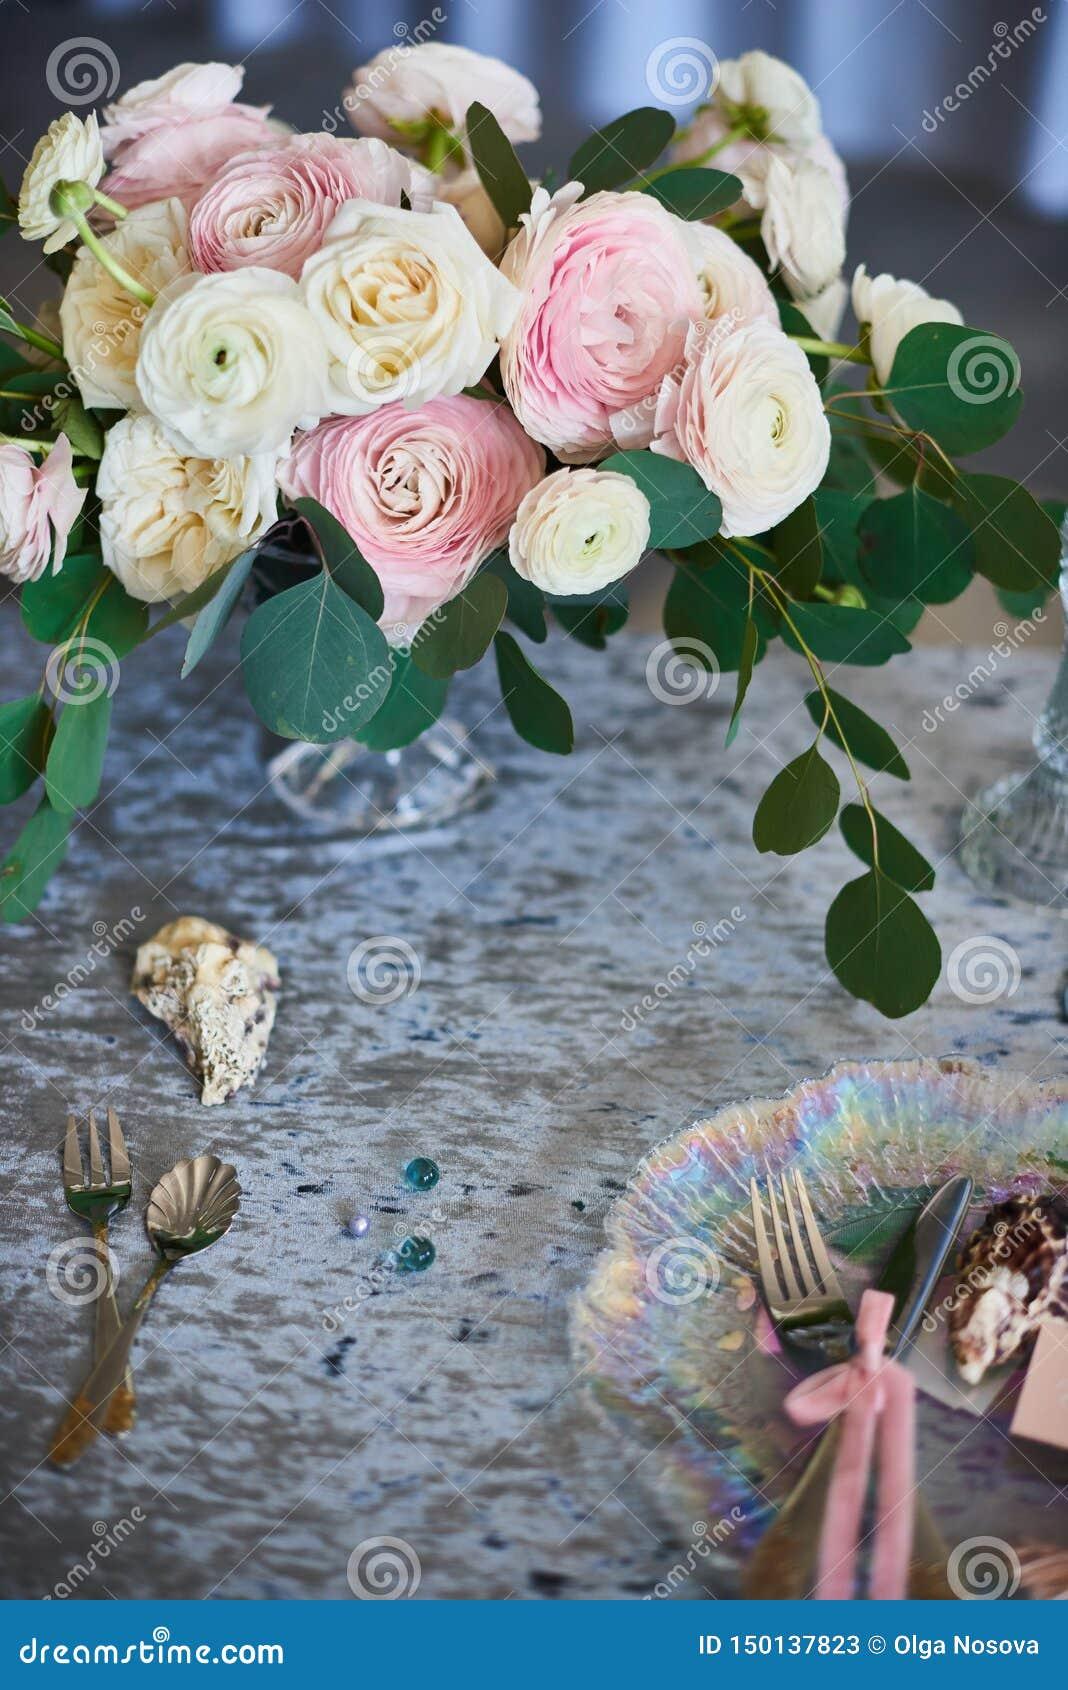 Vintage Wedding Decor. Beautiful Event Venue. Creative Decoration ...